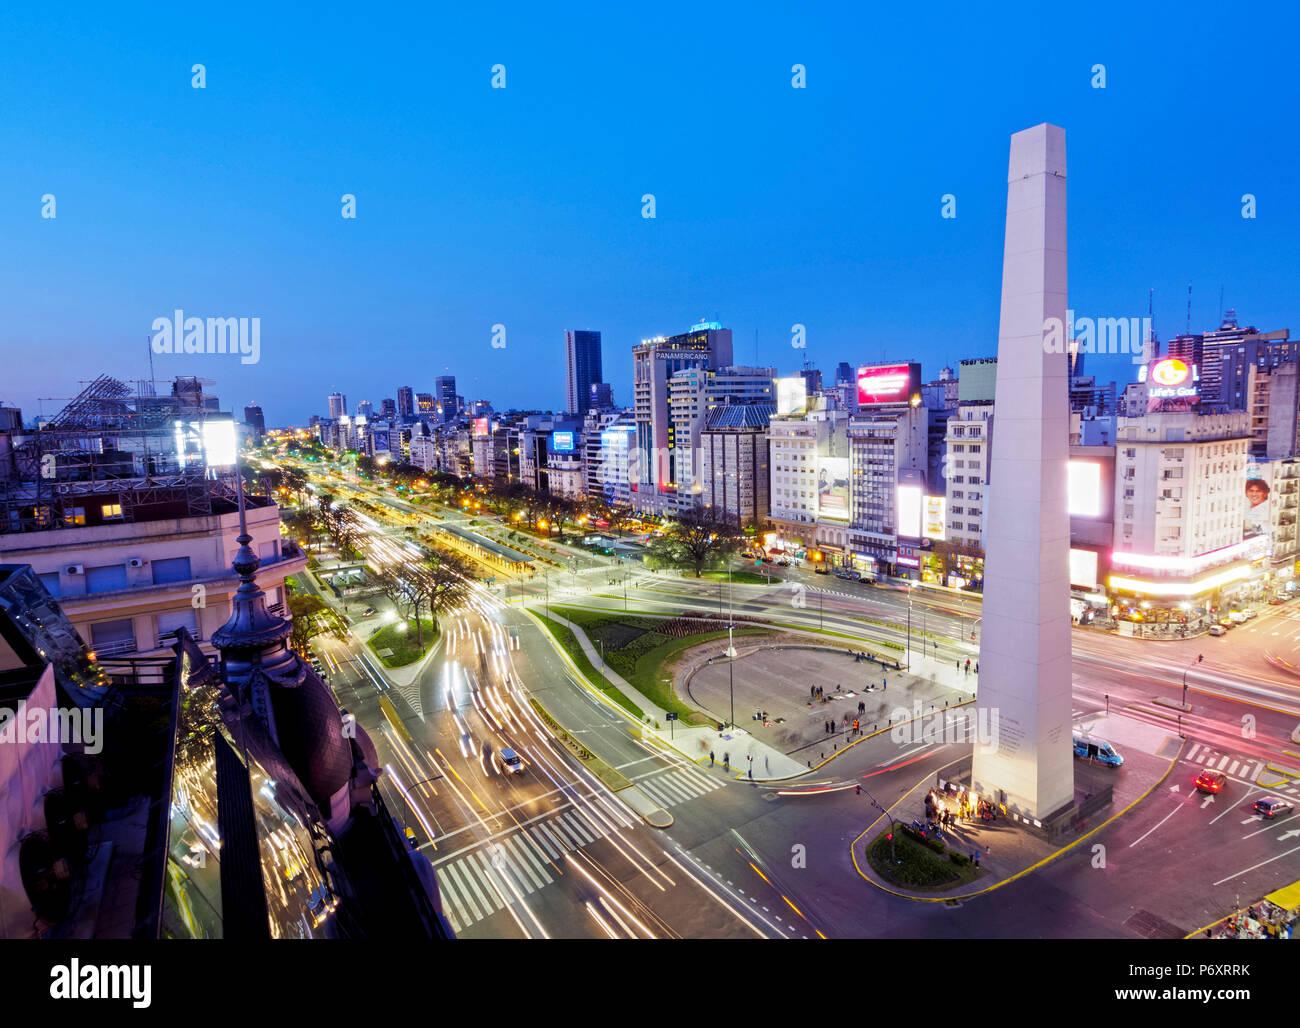 Argentina, Buenos Aires Province, City of Buenos Aires, Twilight view of 9 de Julio Avenue, Plaza de la Republica and Obelisco de Buenos Aires. - Stock Image